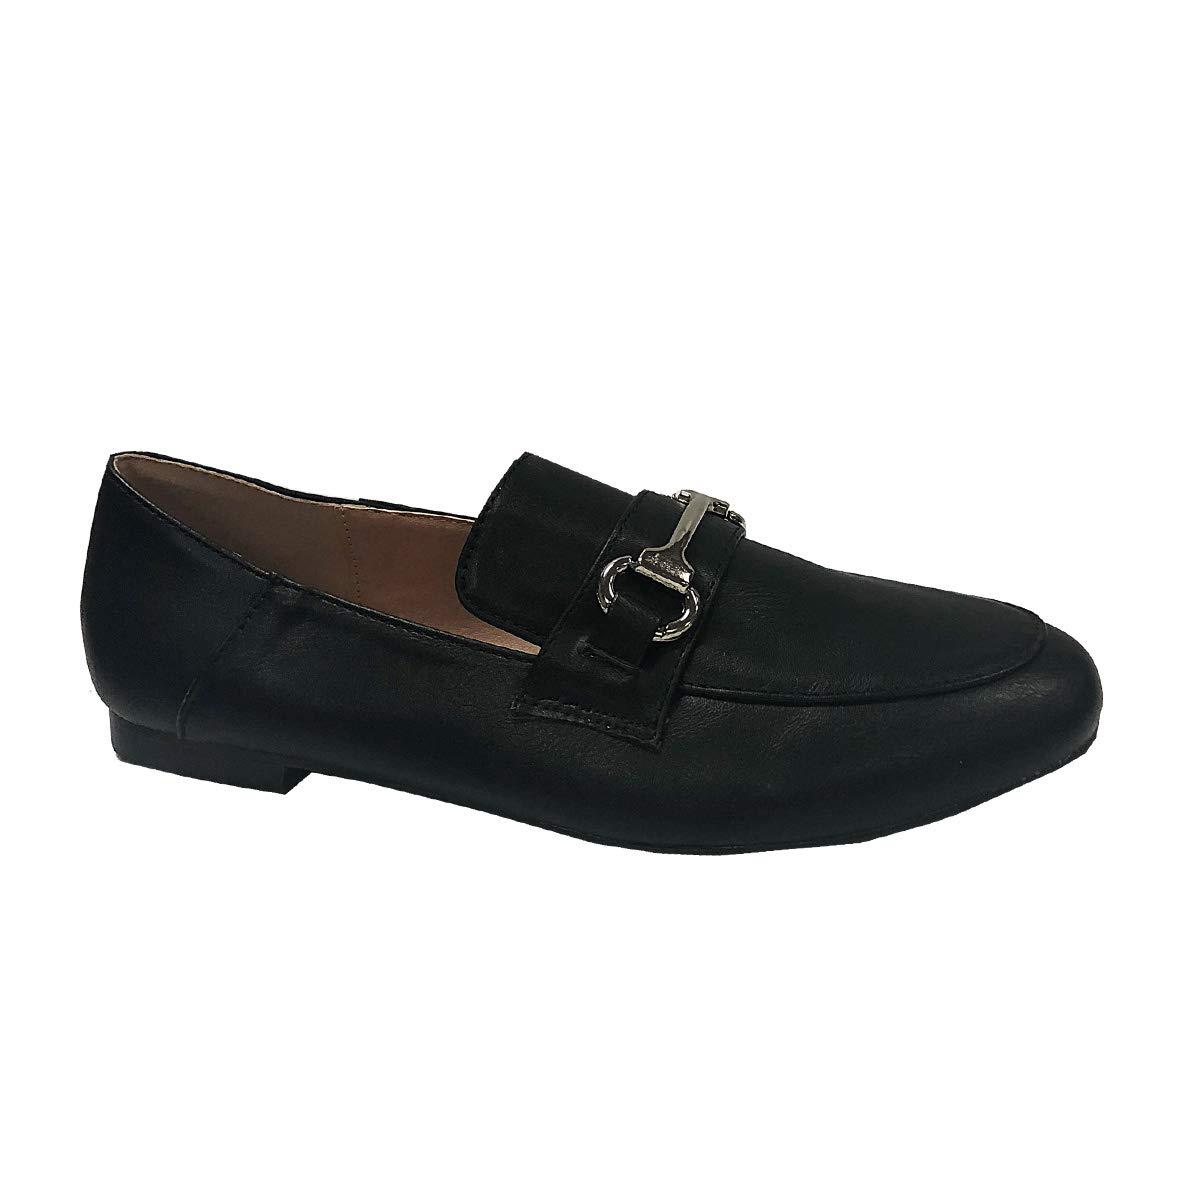 Yoki Womens Buckle Suede CHASLIE-15 Slip-on Flat Loafers